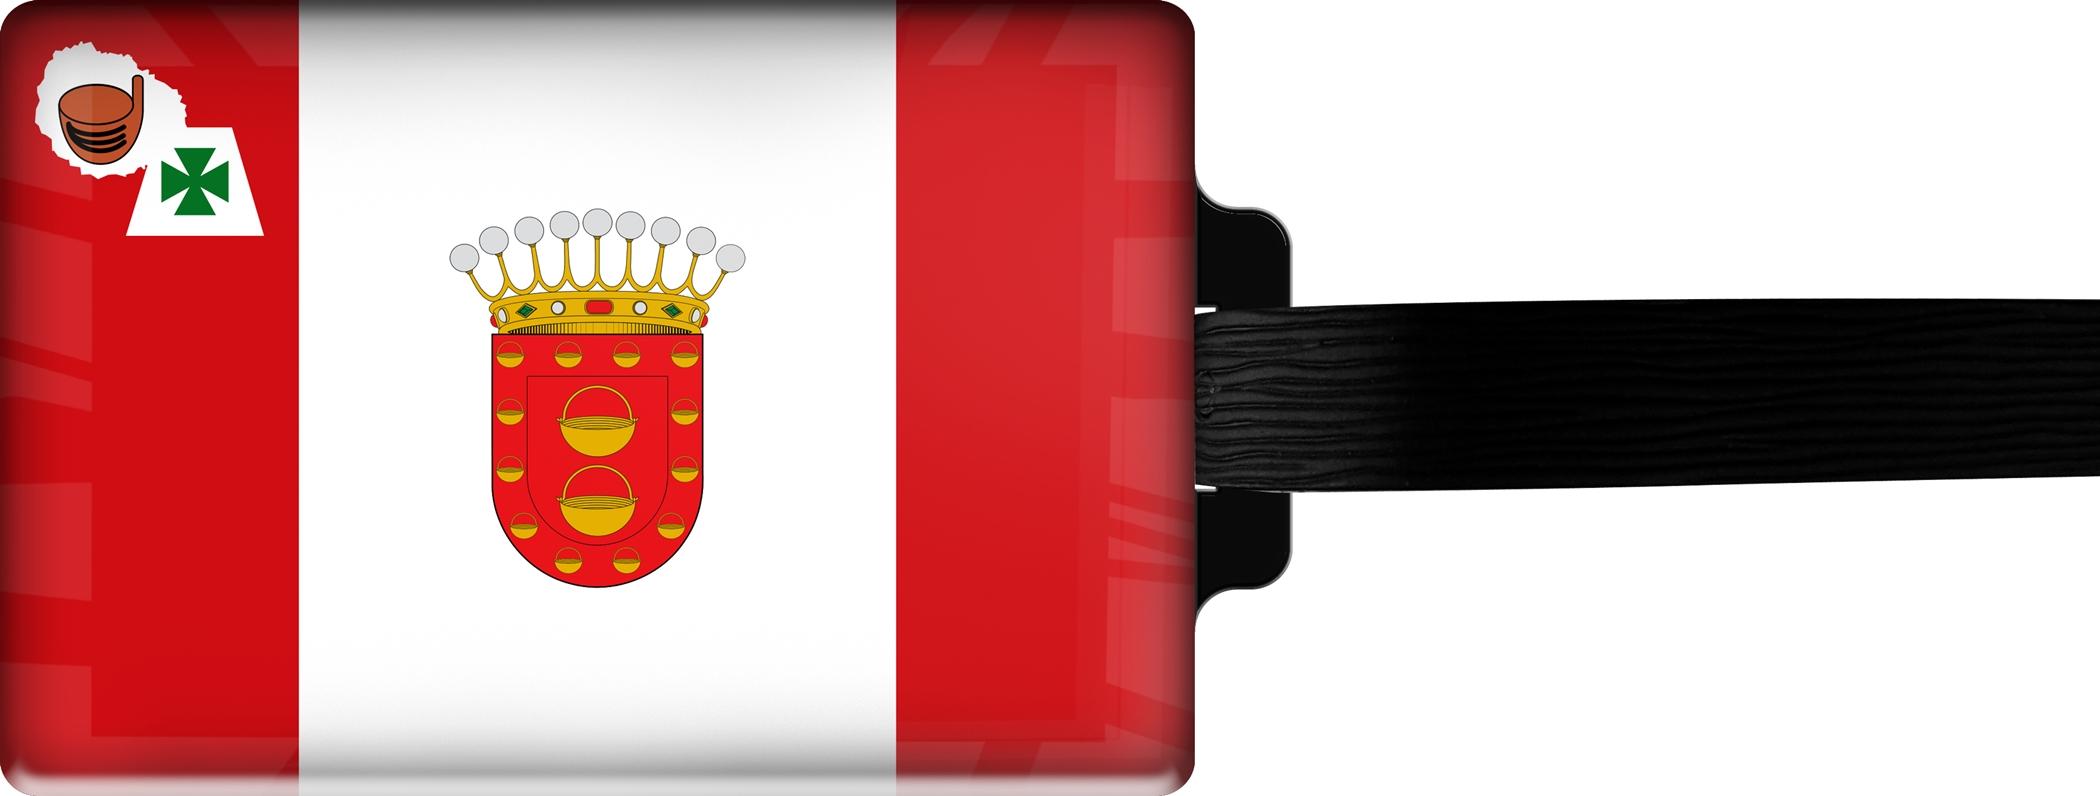 Hochwertiger Gepäckanhänger aus Acrylglas | FLAGGE LA GOMERA | metALUm #00096